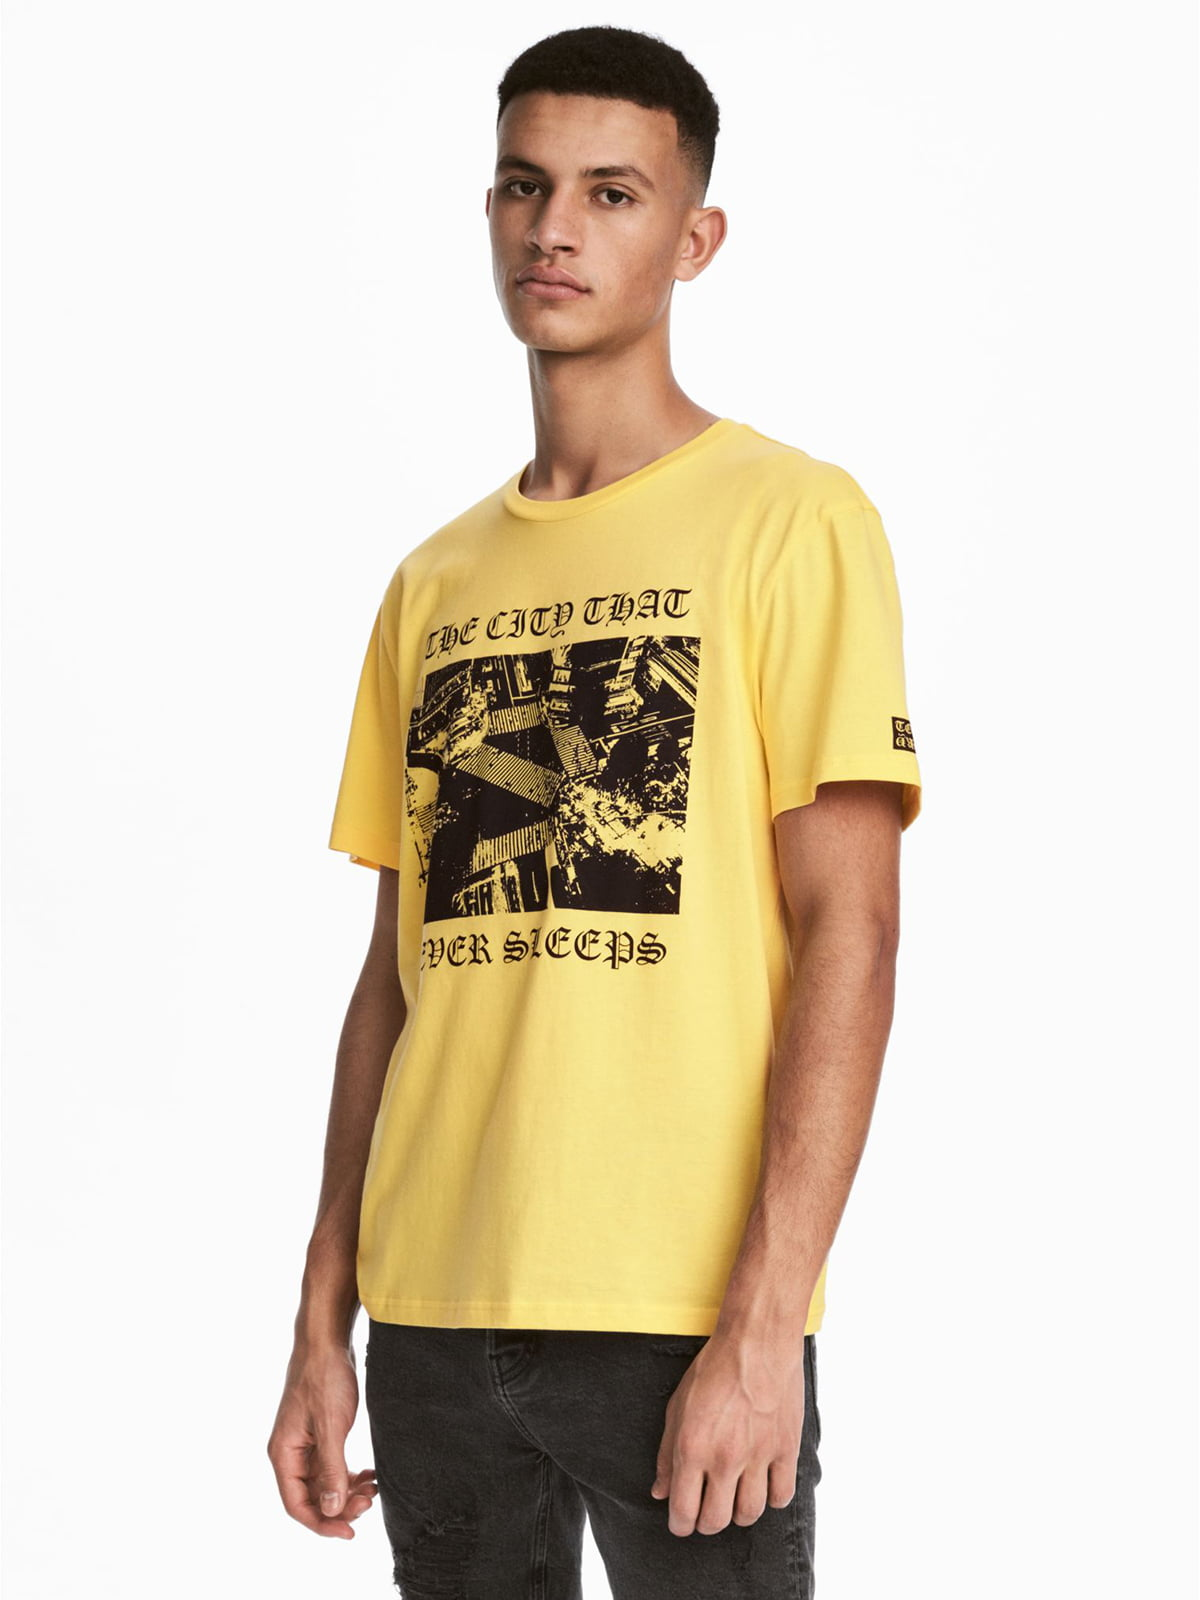 Футболка жовта з принтом | 5711393